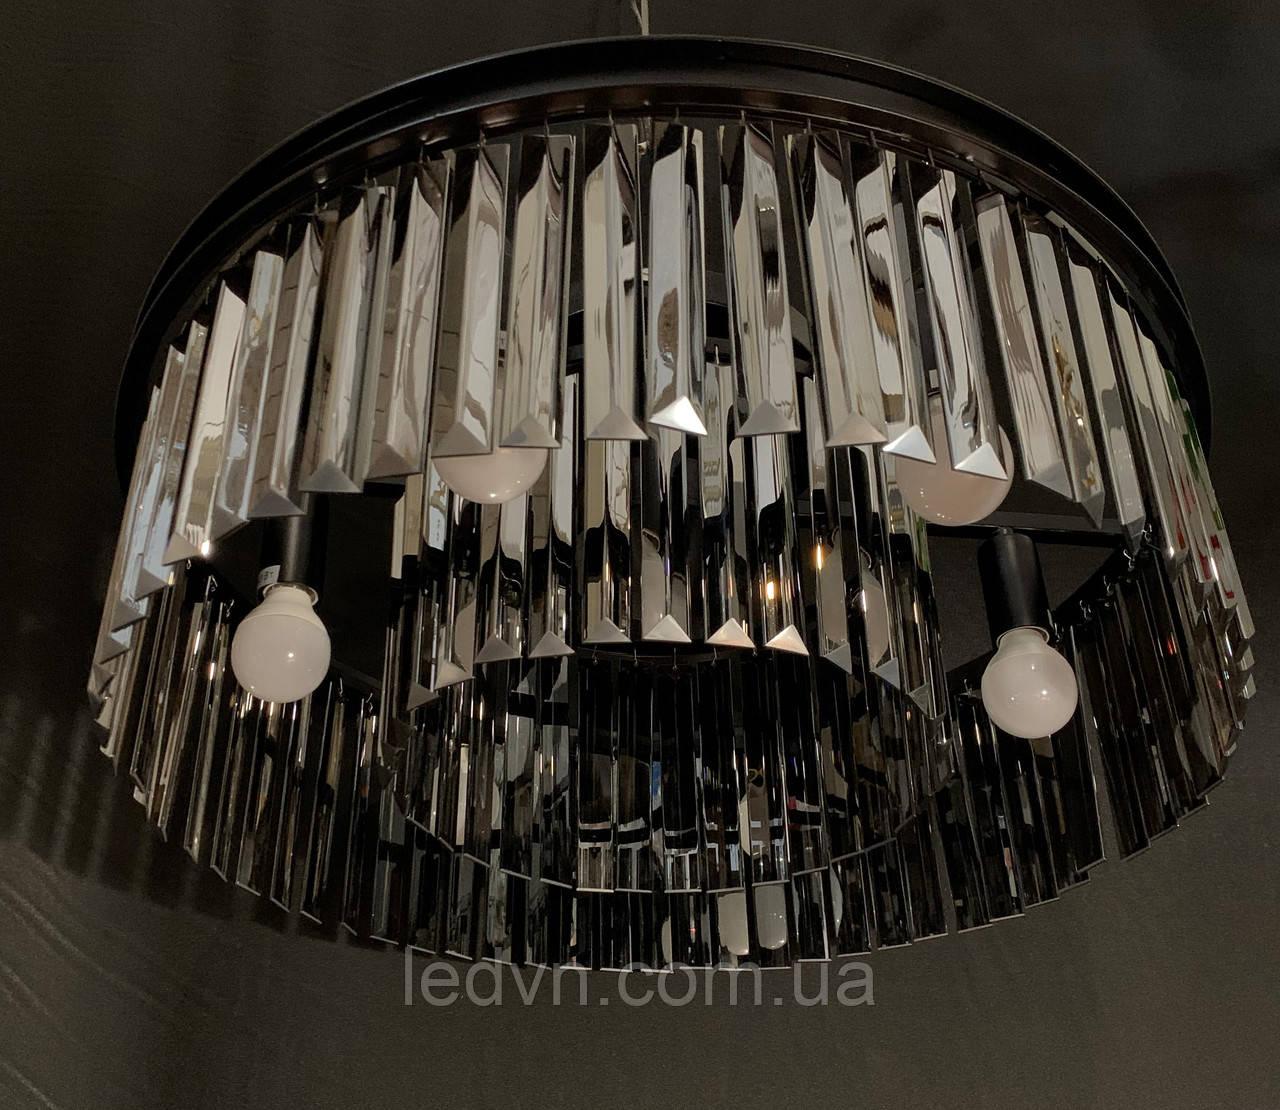 Шикарна сучасна кришталева люстра на 6 ламп чорна 55 см діаметр